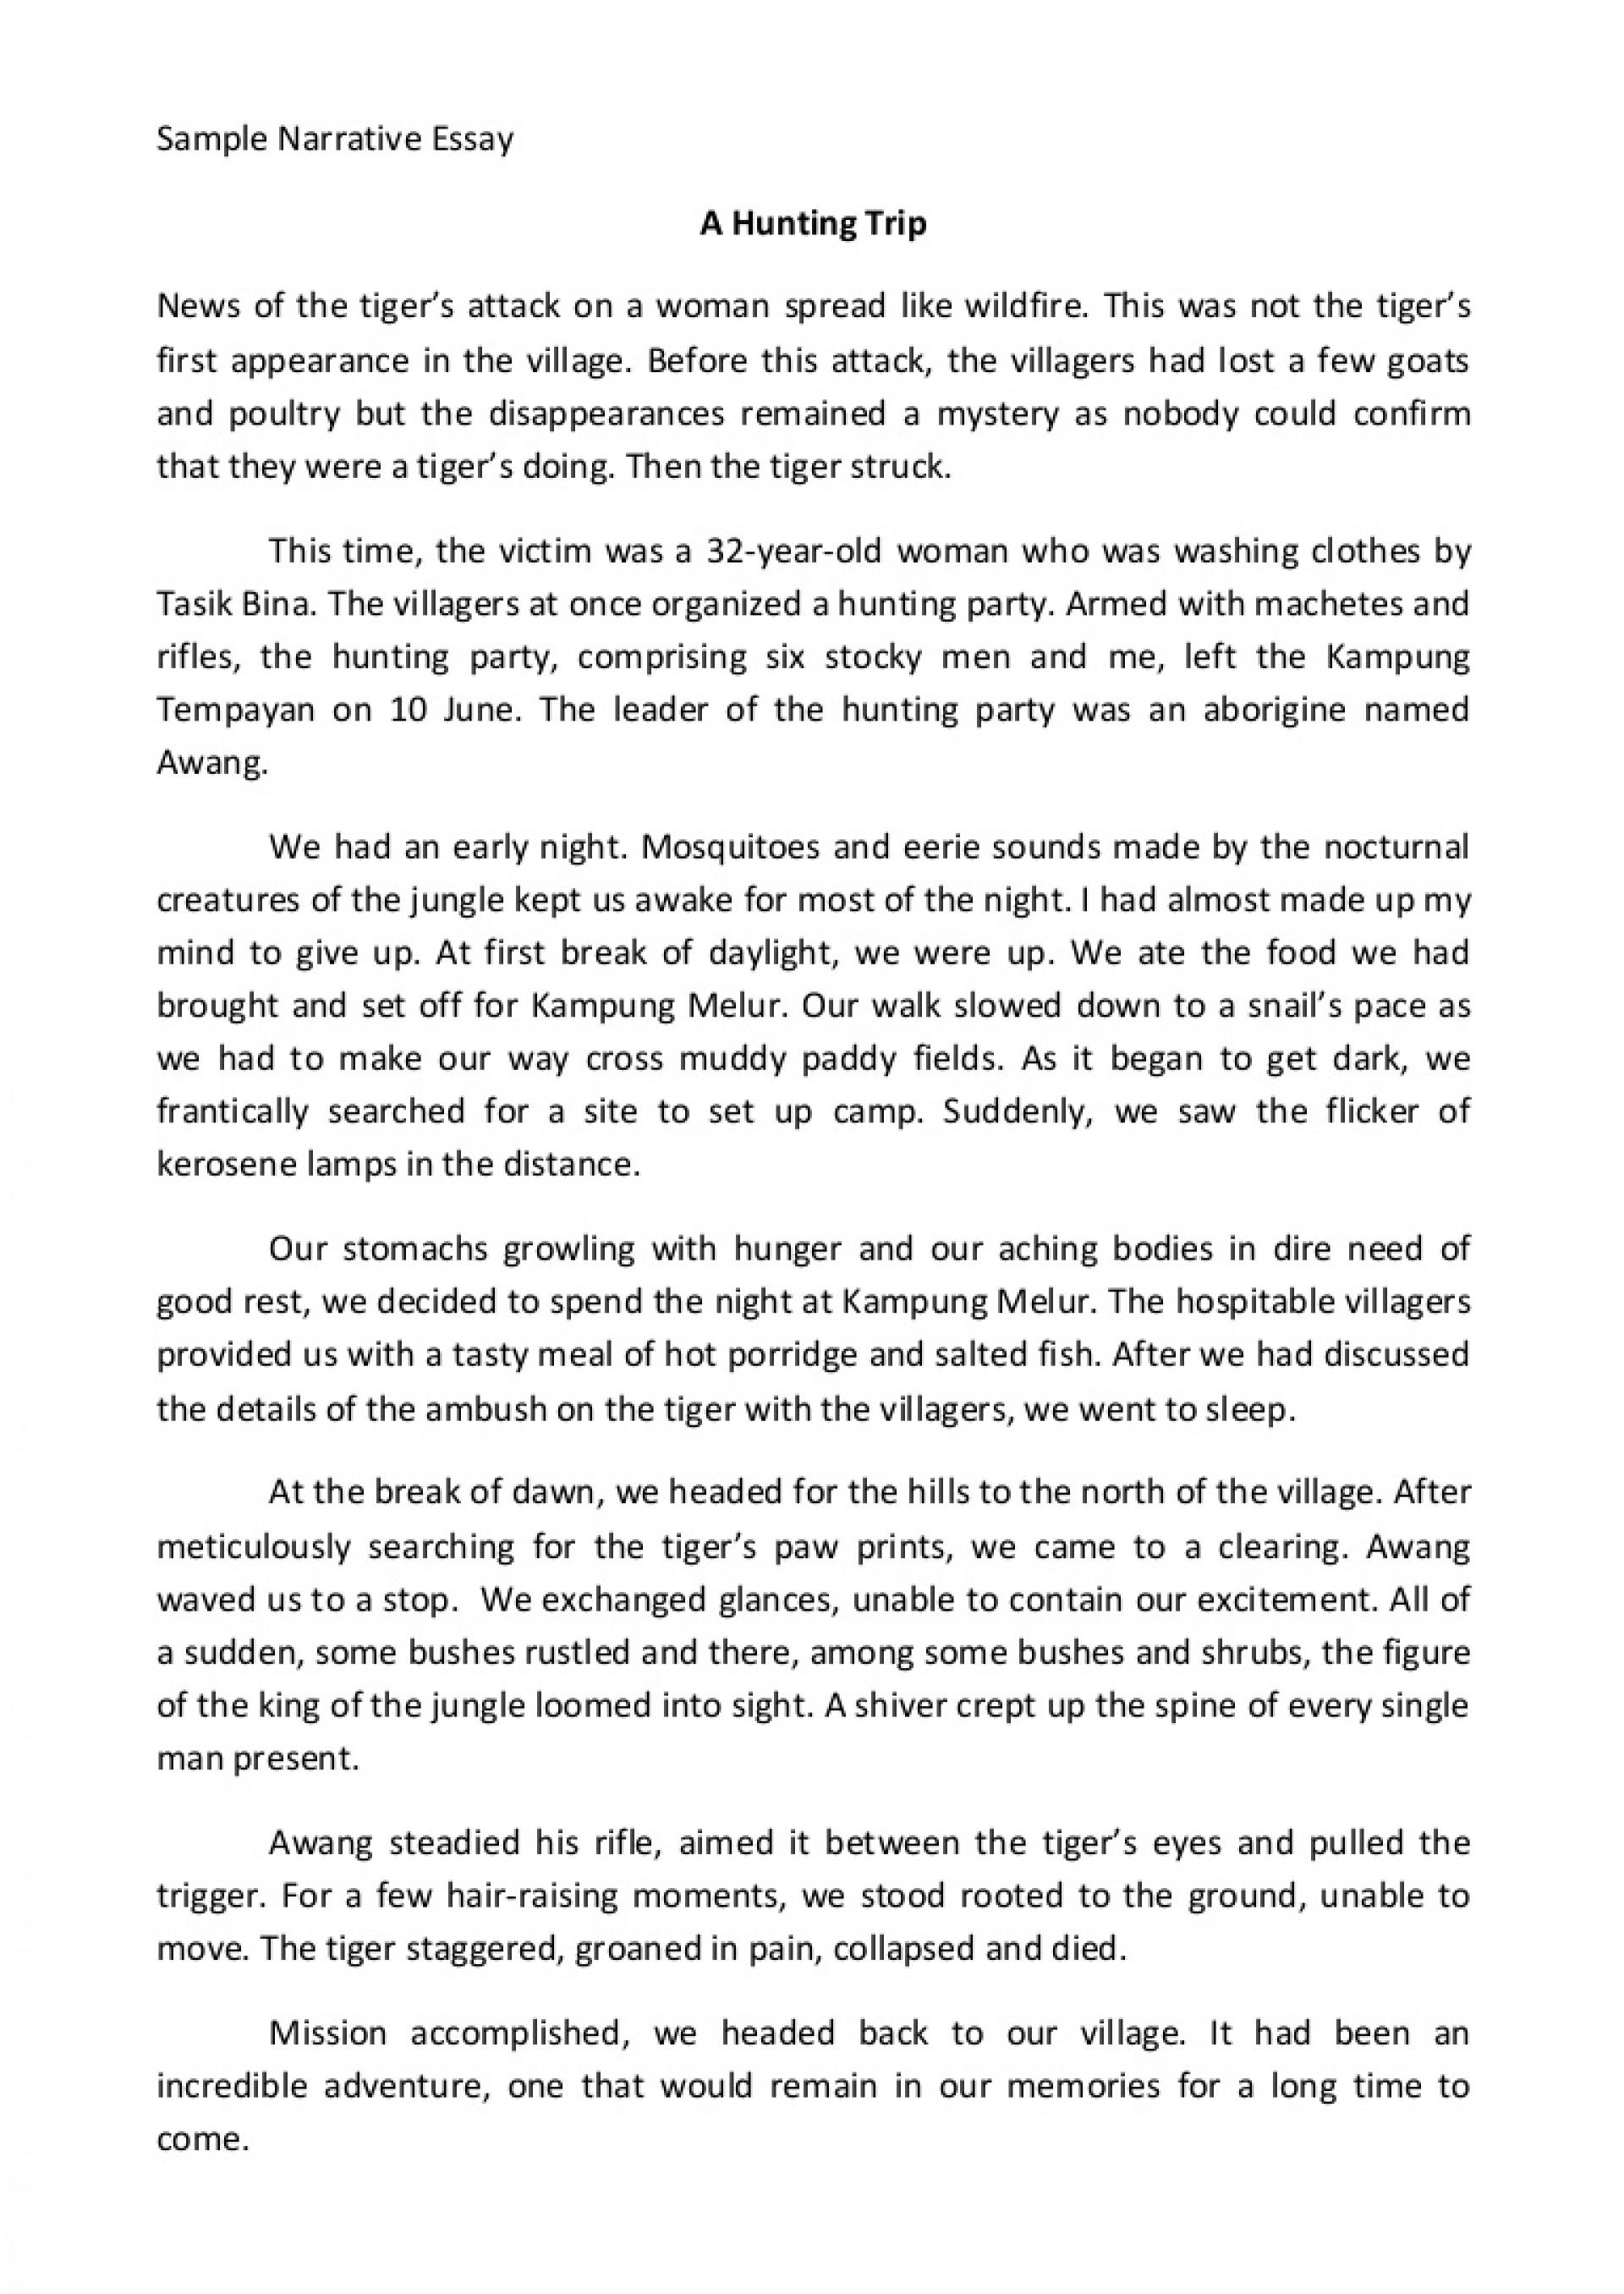 003 Samplenarrativeessay Phpapp02 Thumbnail Narrative Essay Samples Unforgettable Examples High School Format Interesting Spm 1920